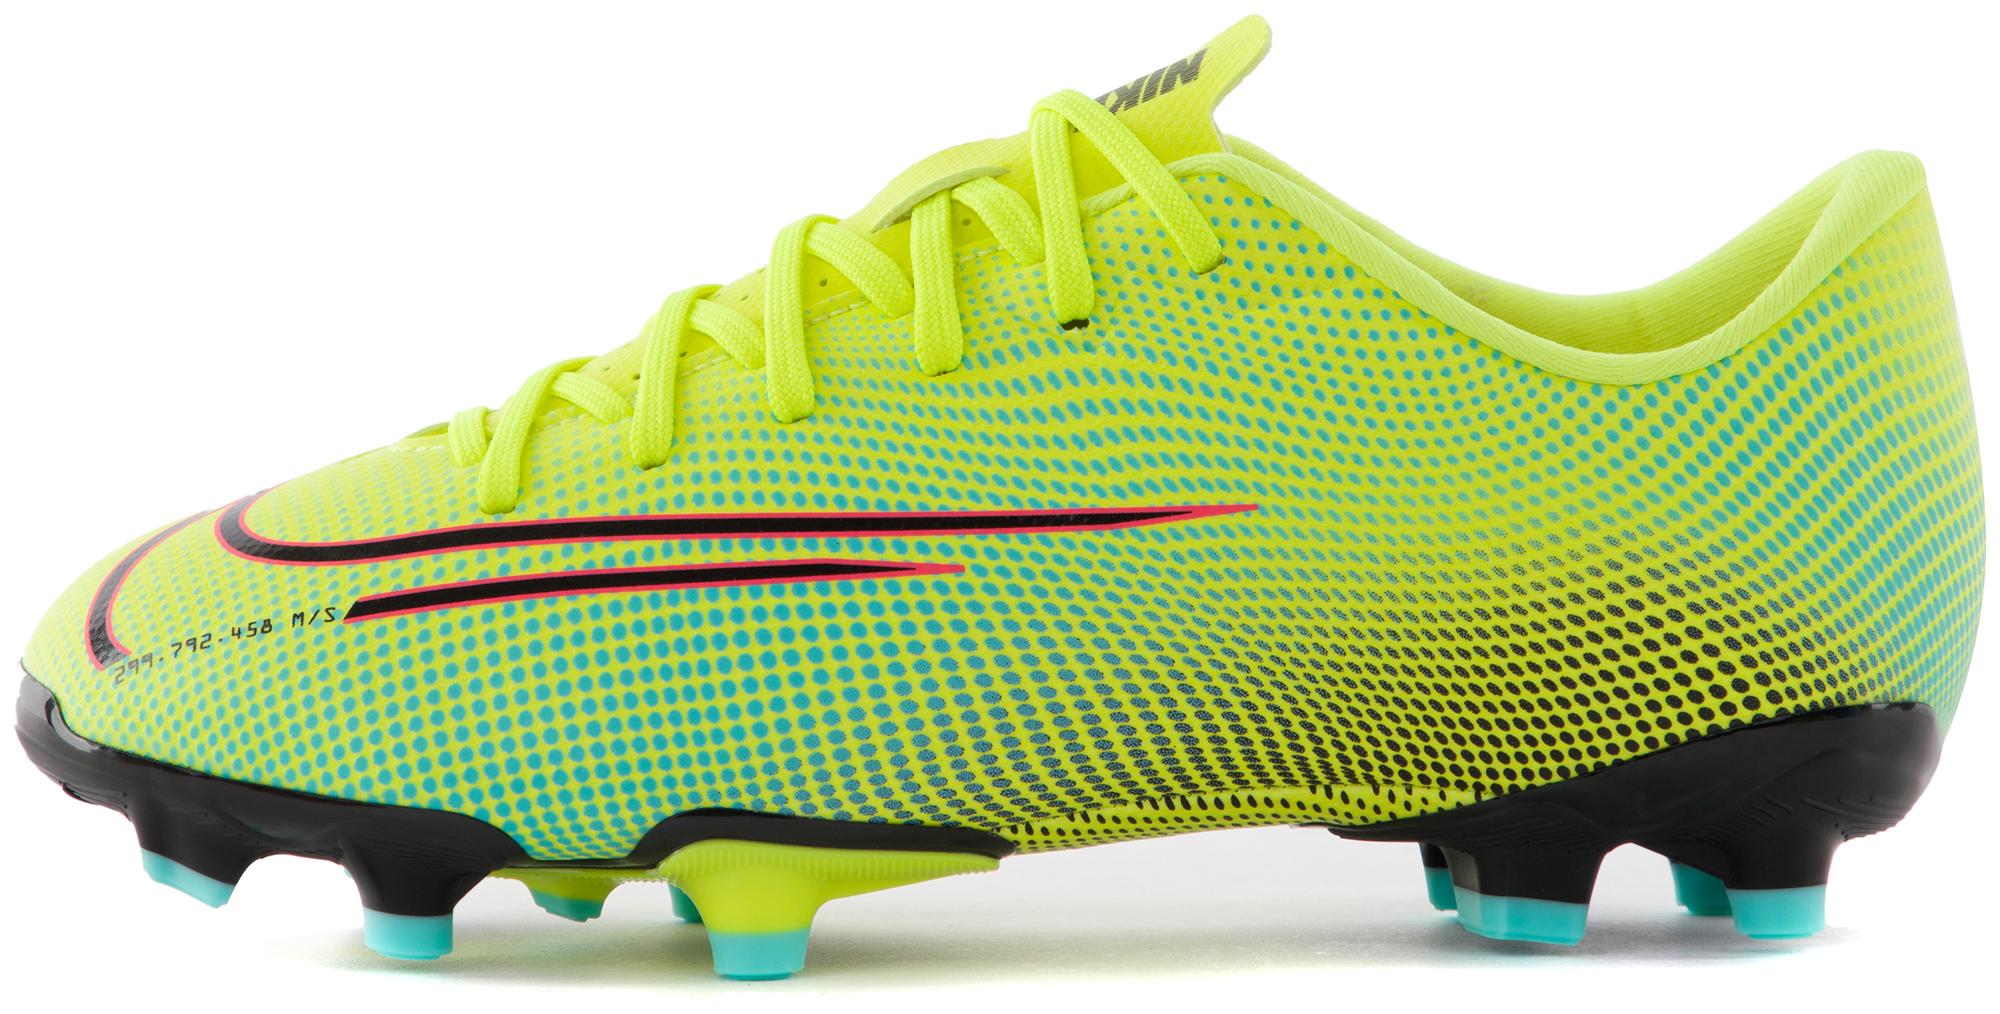 цена Nike Бутсы для мальчиков Nike Vapor 13 Academy MDS FG/MG, размер 36.5 онлайн в 2017 году